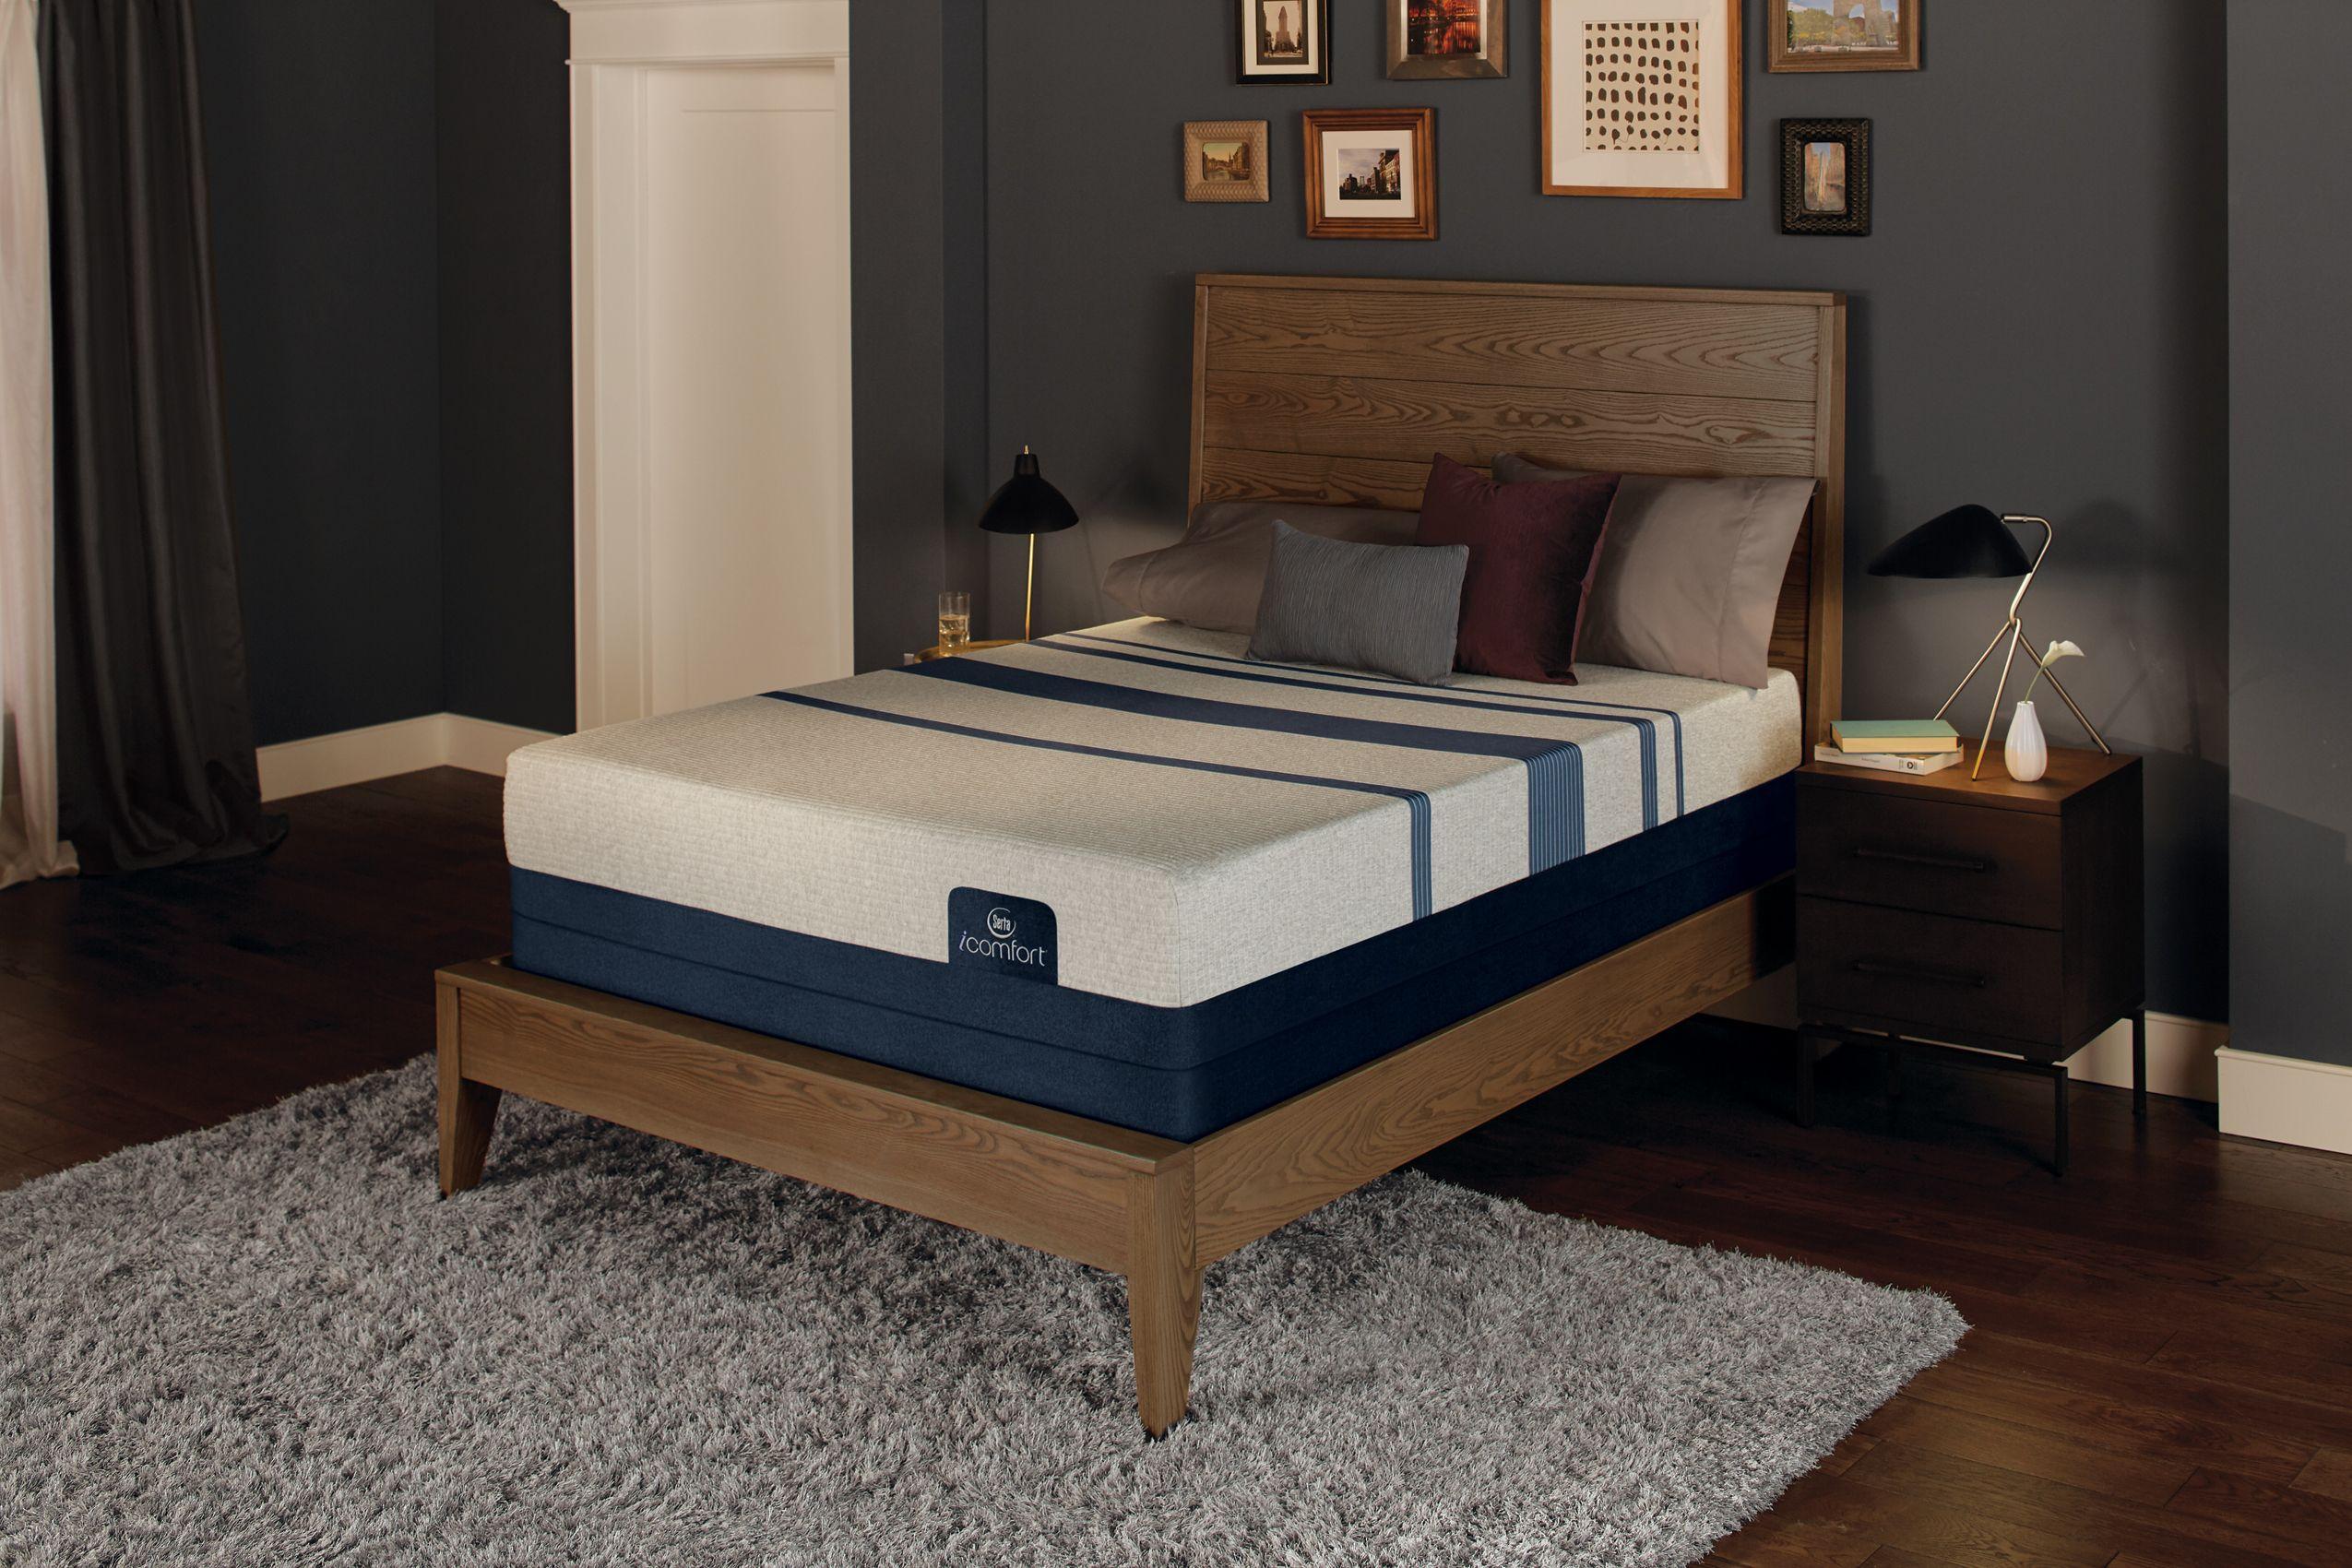 Serta Foam Blue 300 Firm Set Mattress sets